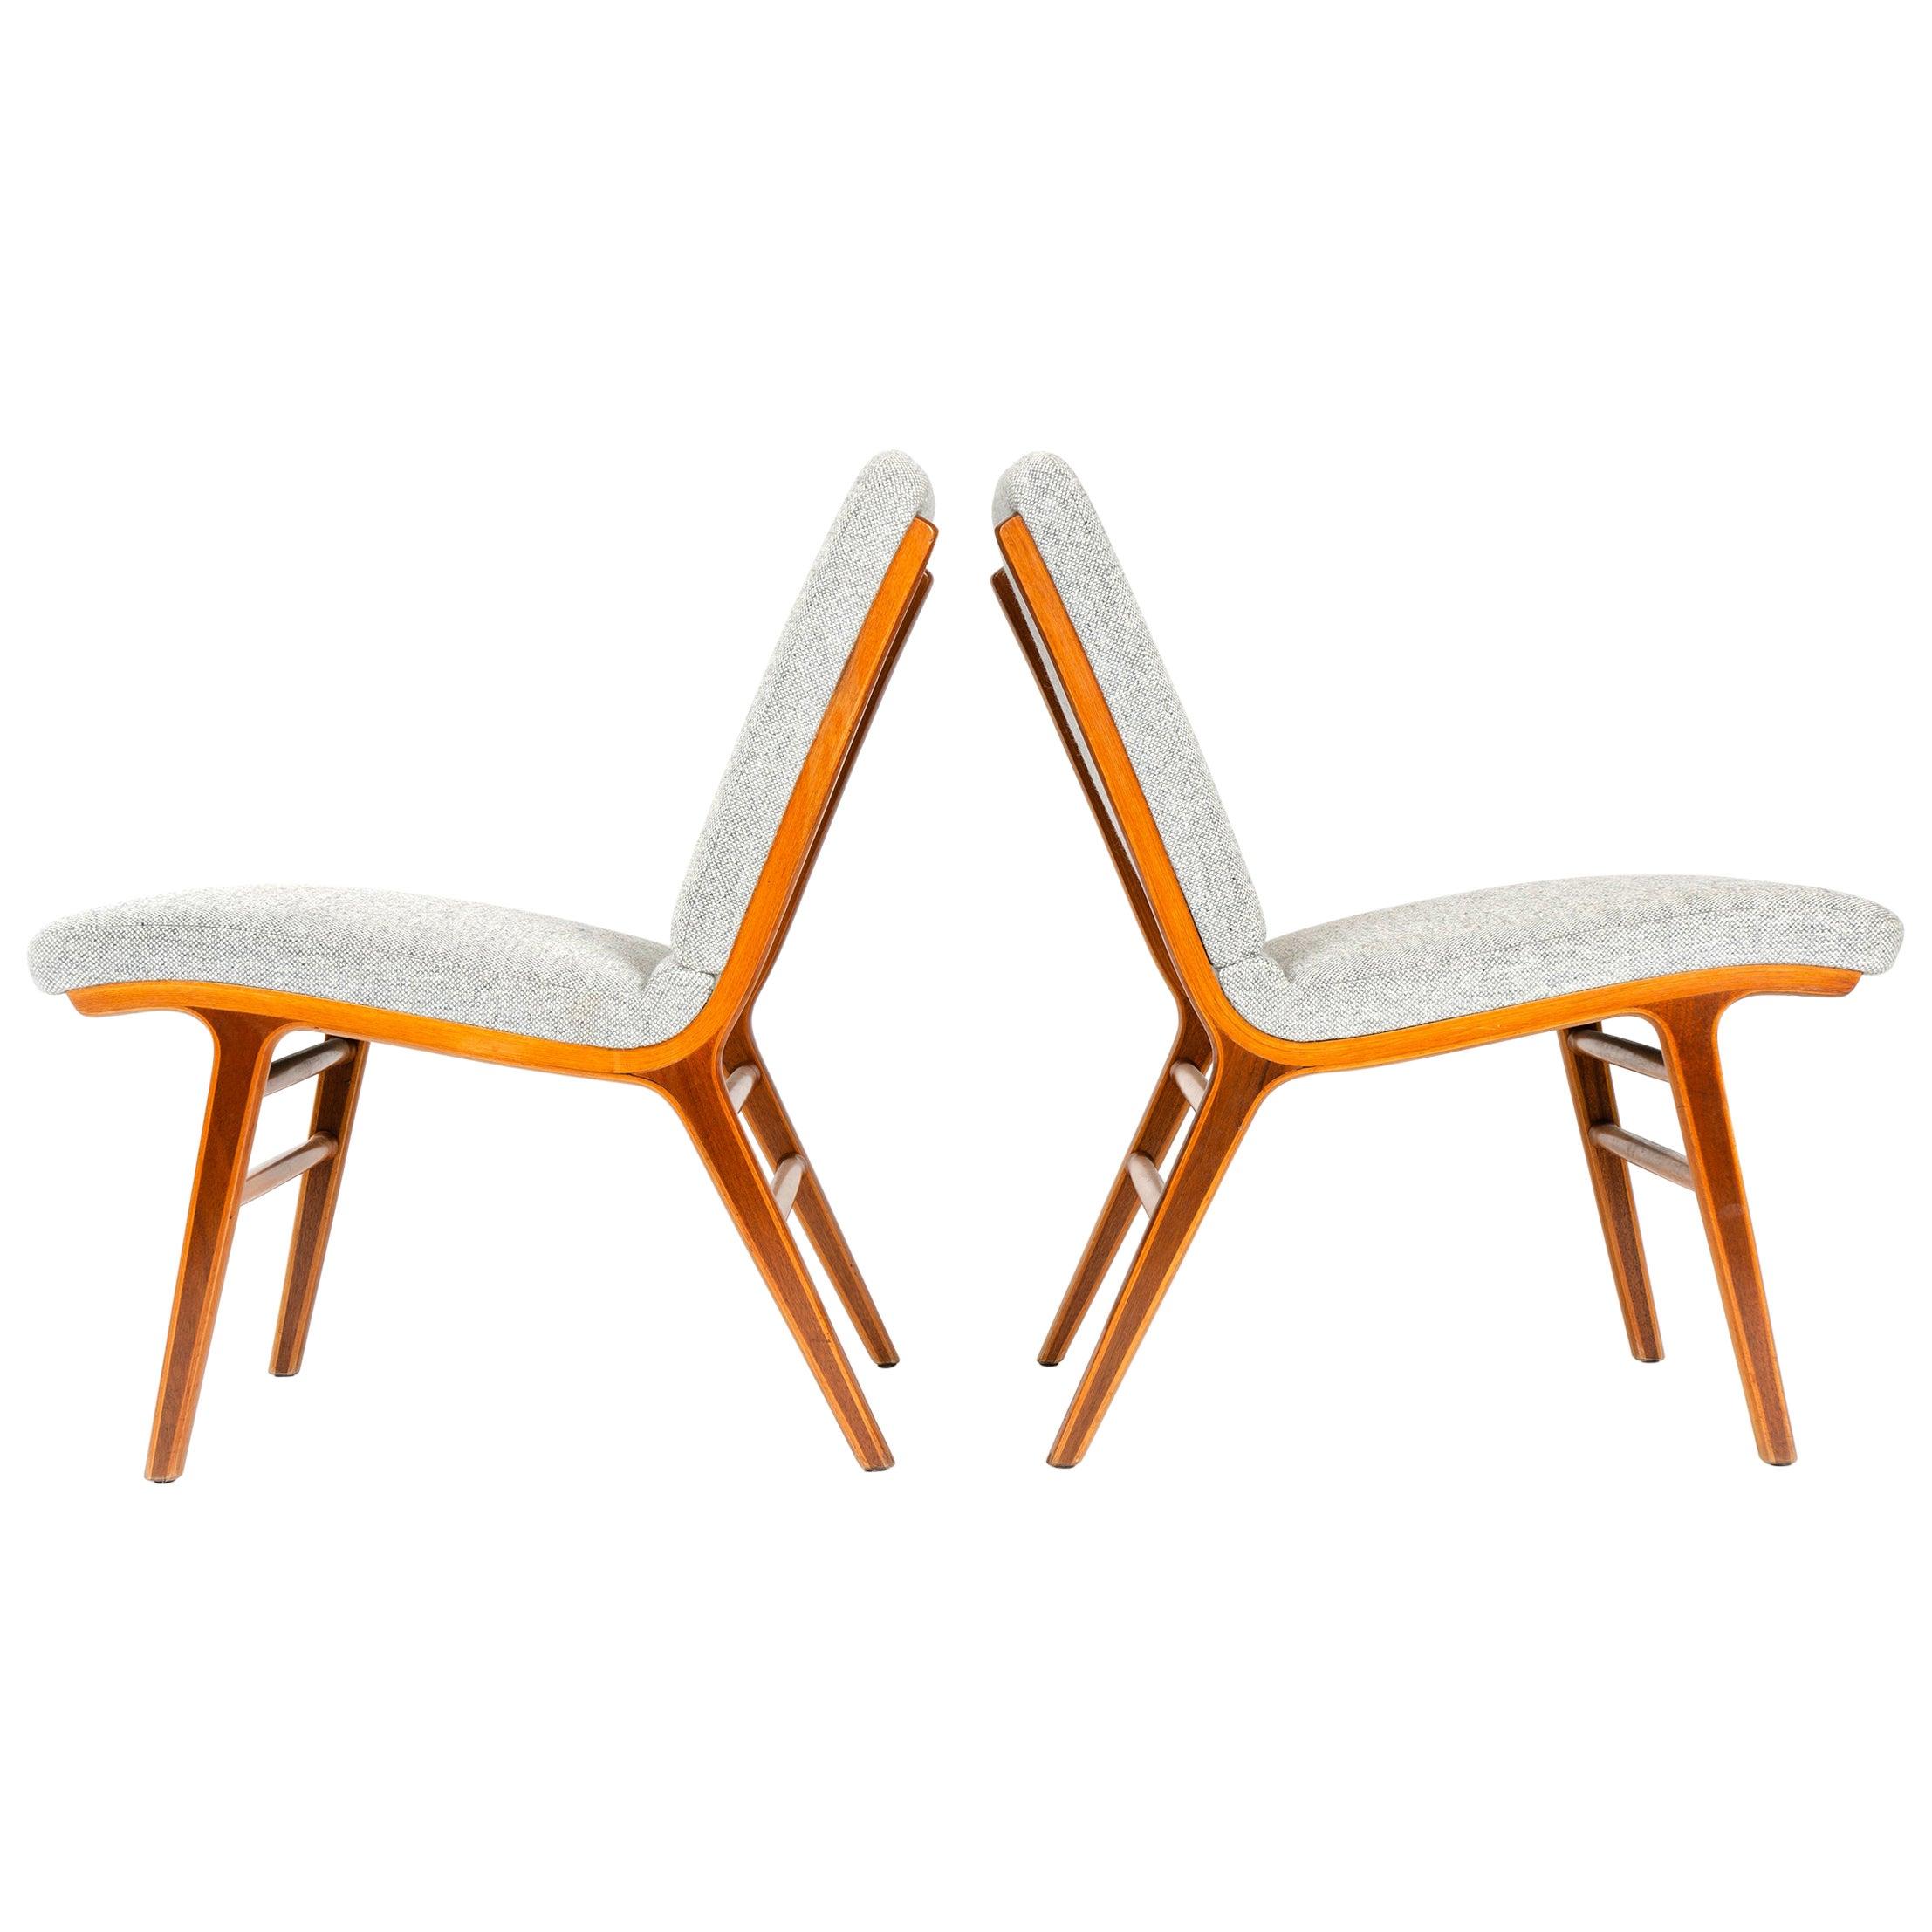 1950s Danish 'Ax' Chairs by Peter Hvidt & Orla Mölgaard-Nielsen for Fritz Hansen